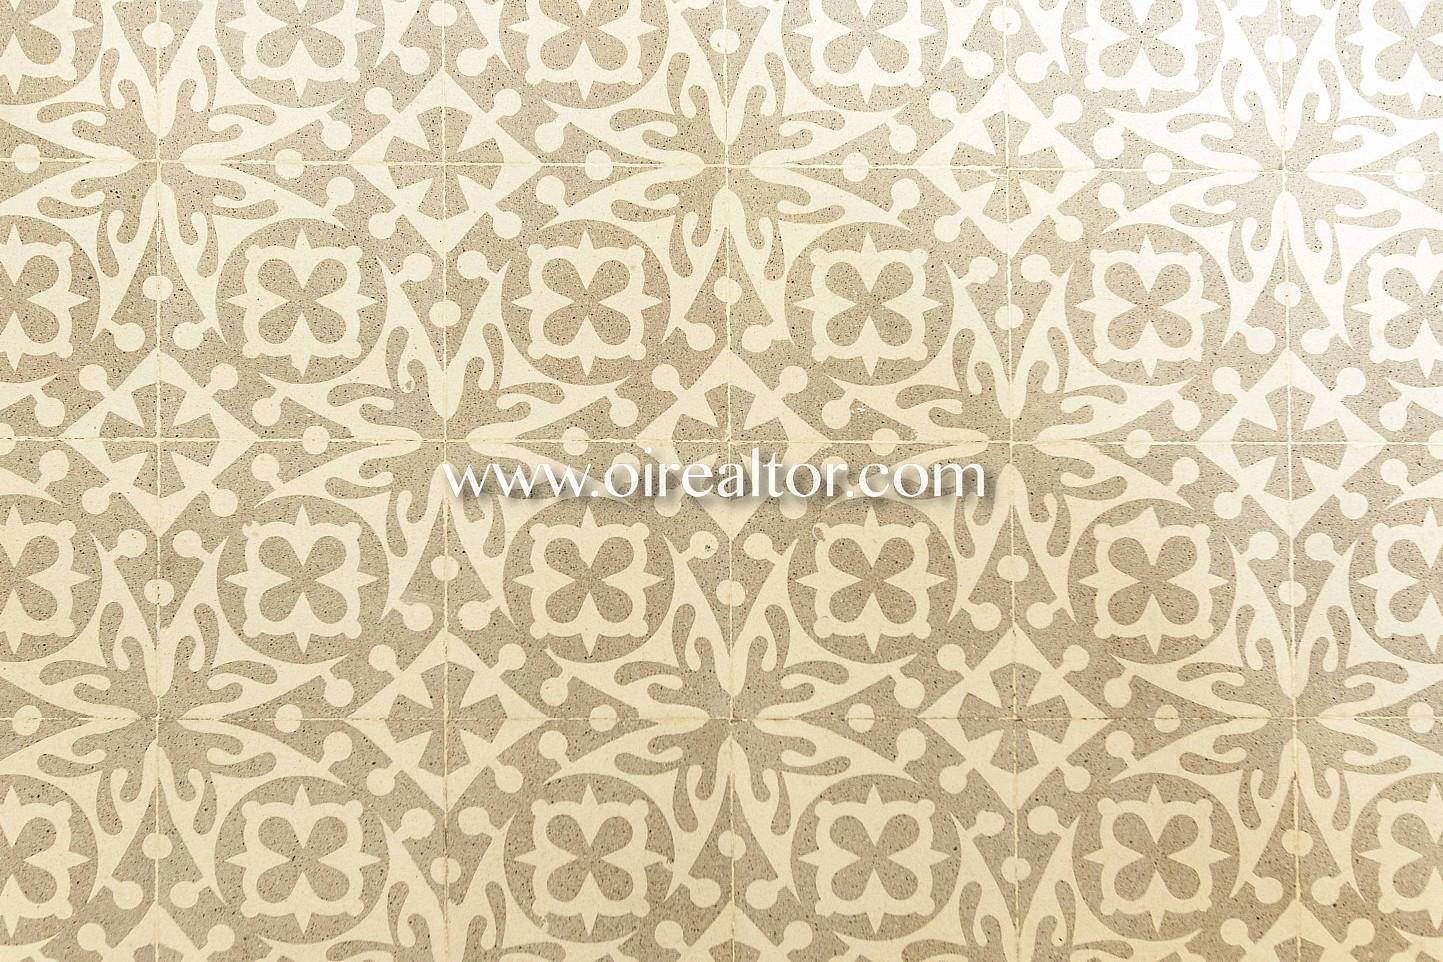 suelo, mosaico, suelo de mosaico, suelo modernista, modernista, modernismo